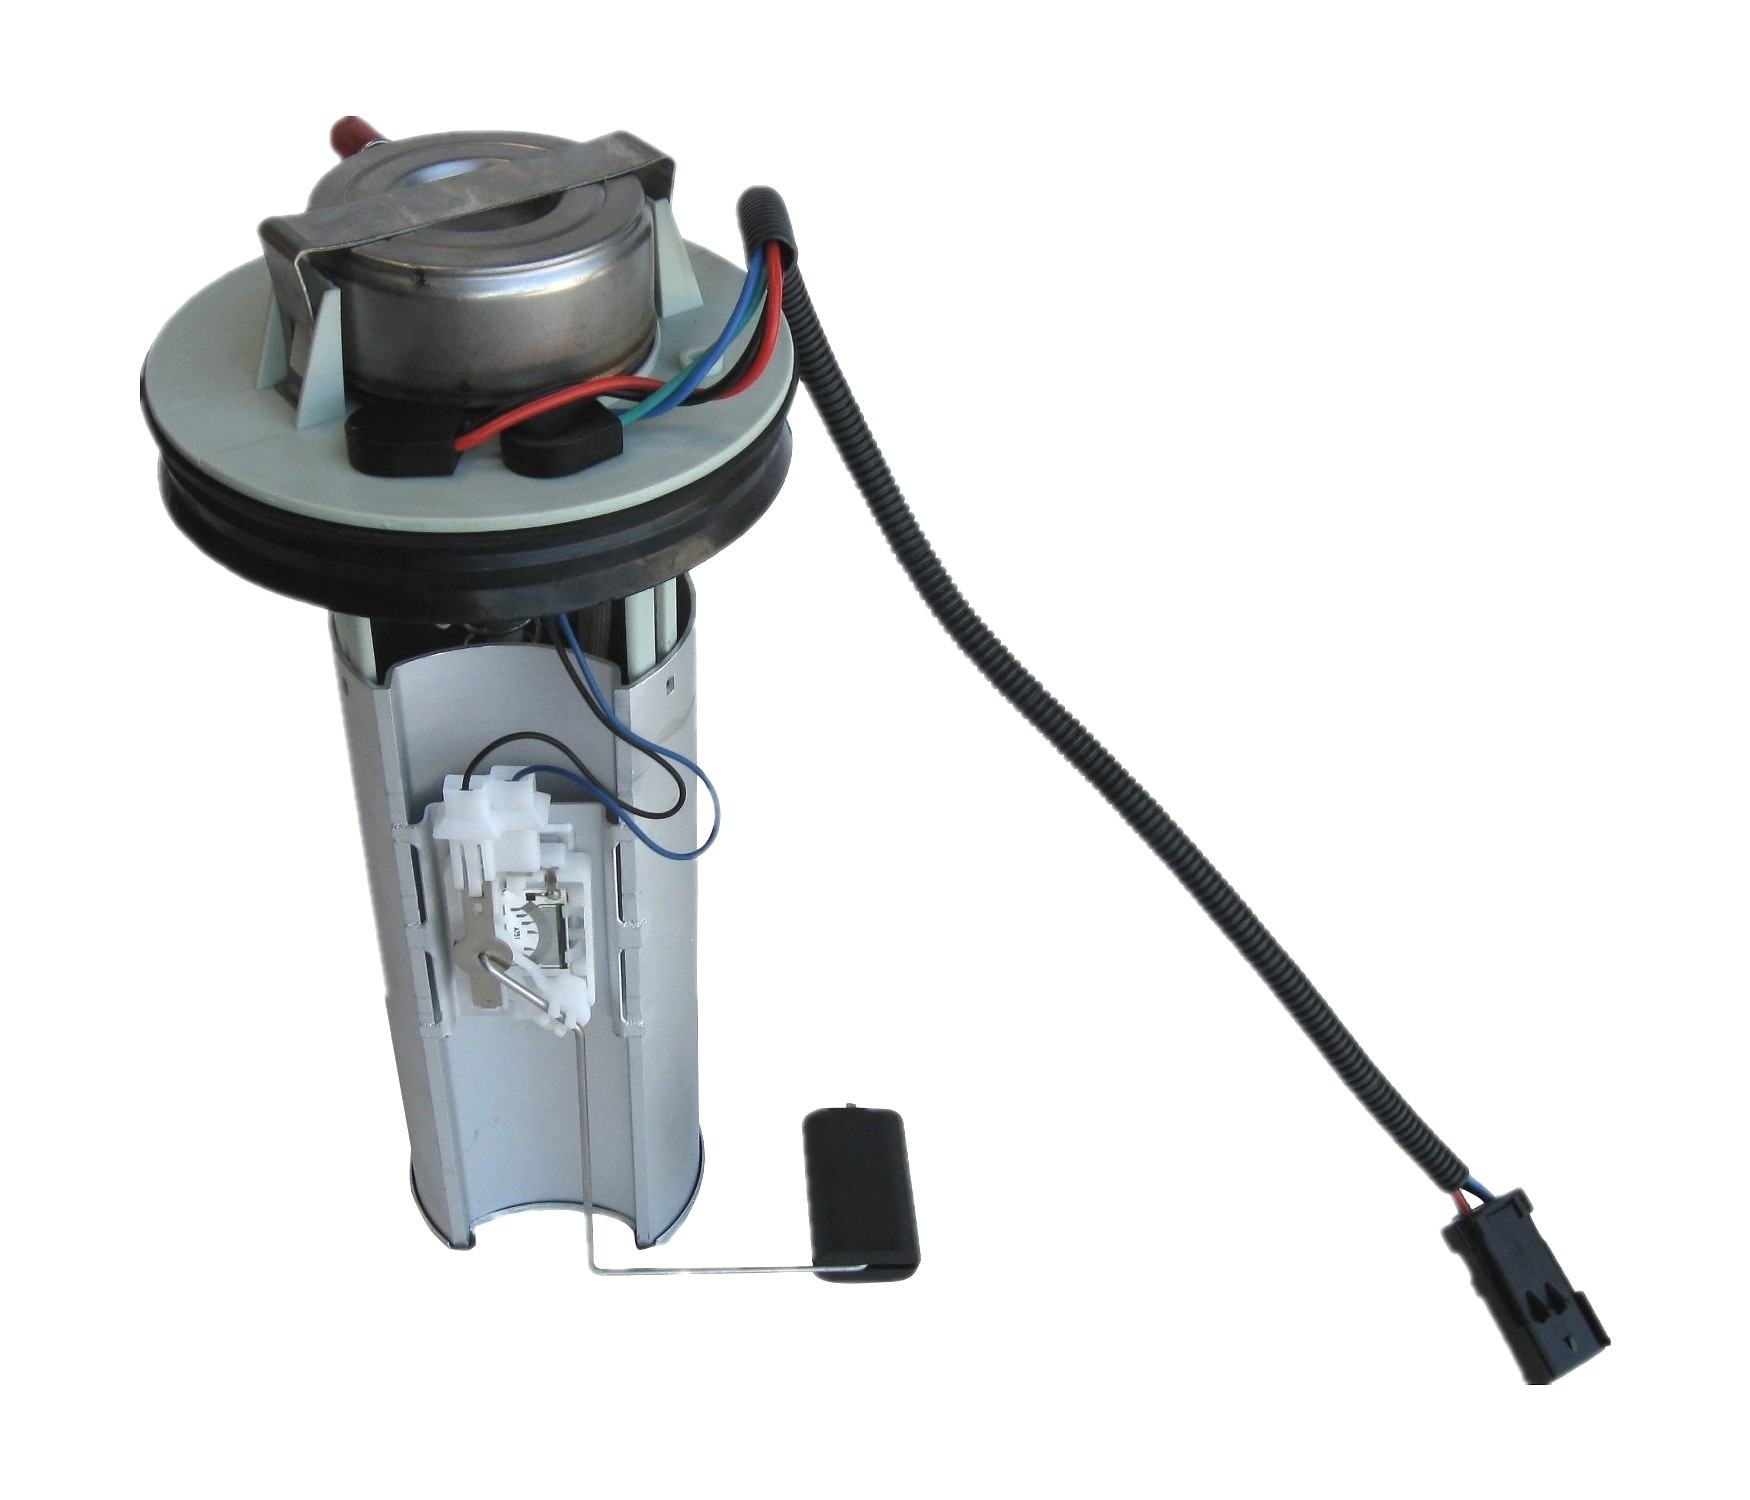 2001 Jeep Tj Fuel Pump Module Assembly Wrangler Filter A0 F3126a